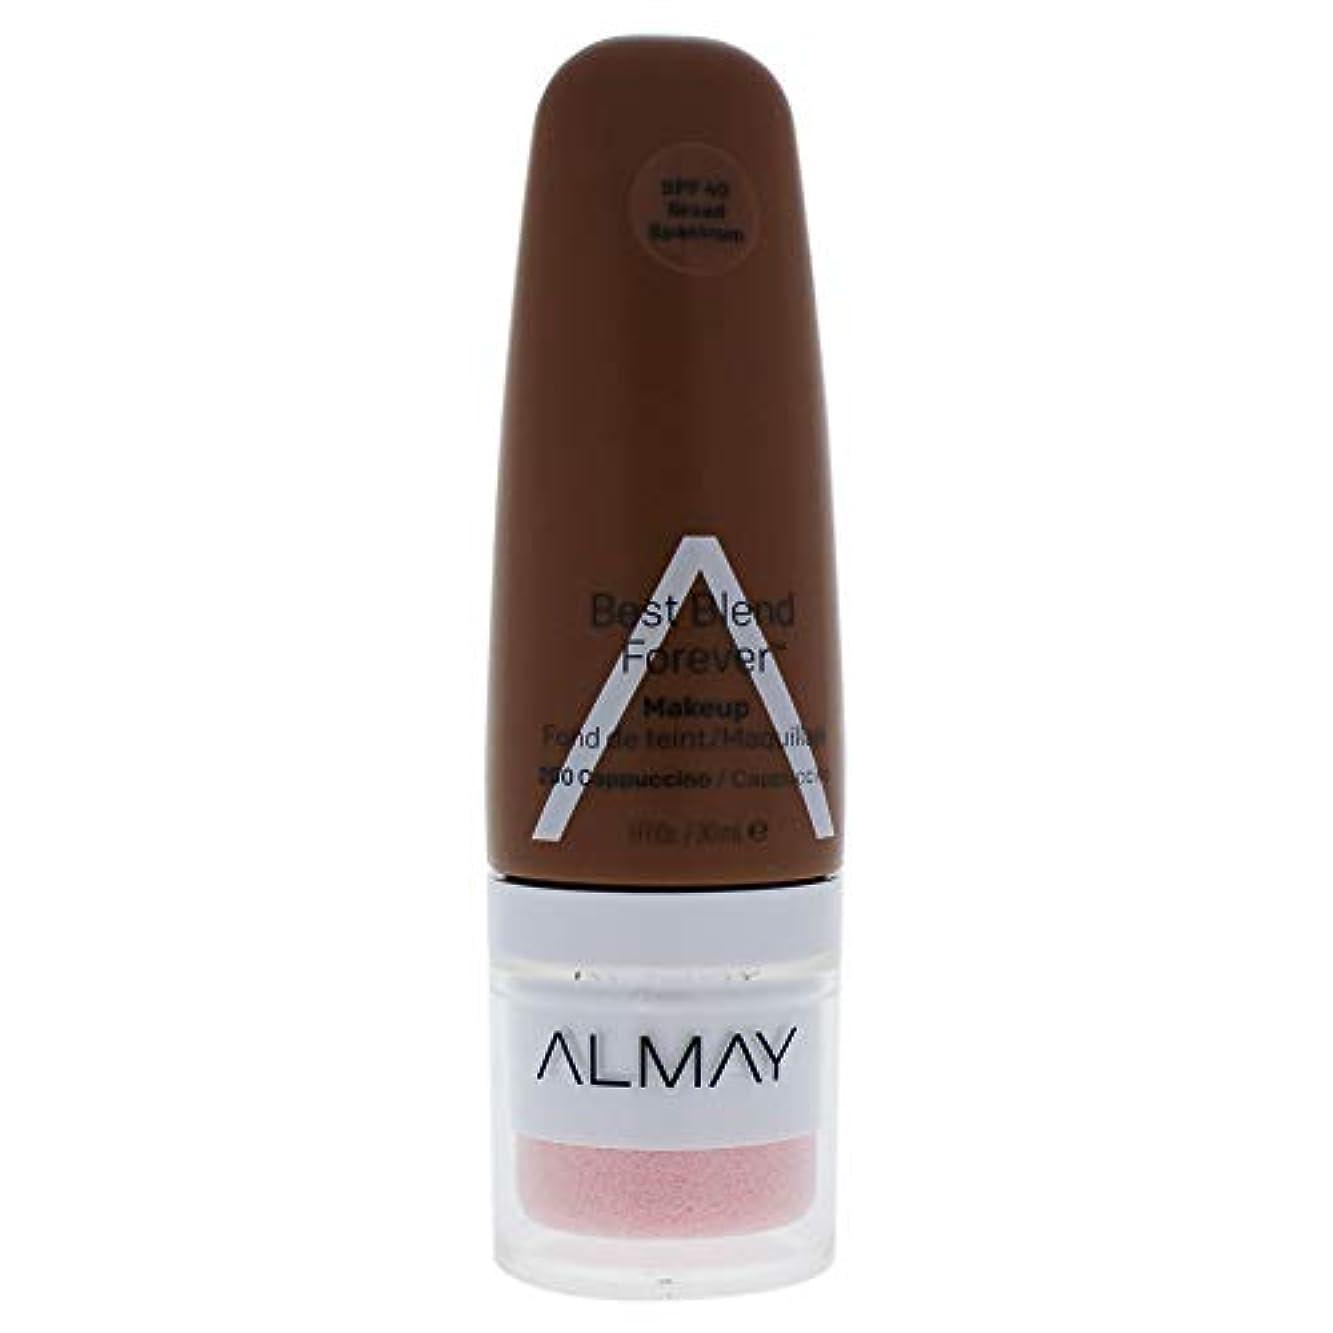 第五危険な偽善者Almay Best Blend Forever Makeup, Cappuccino 200